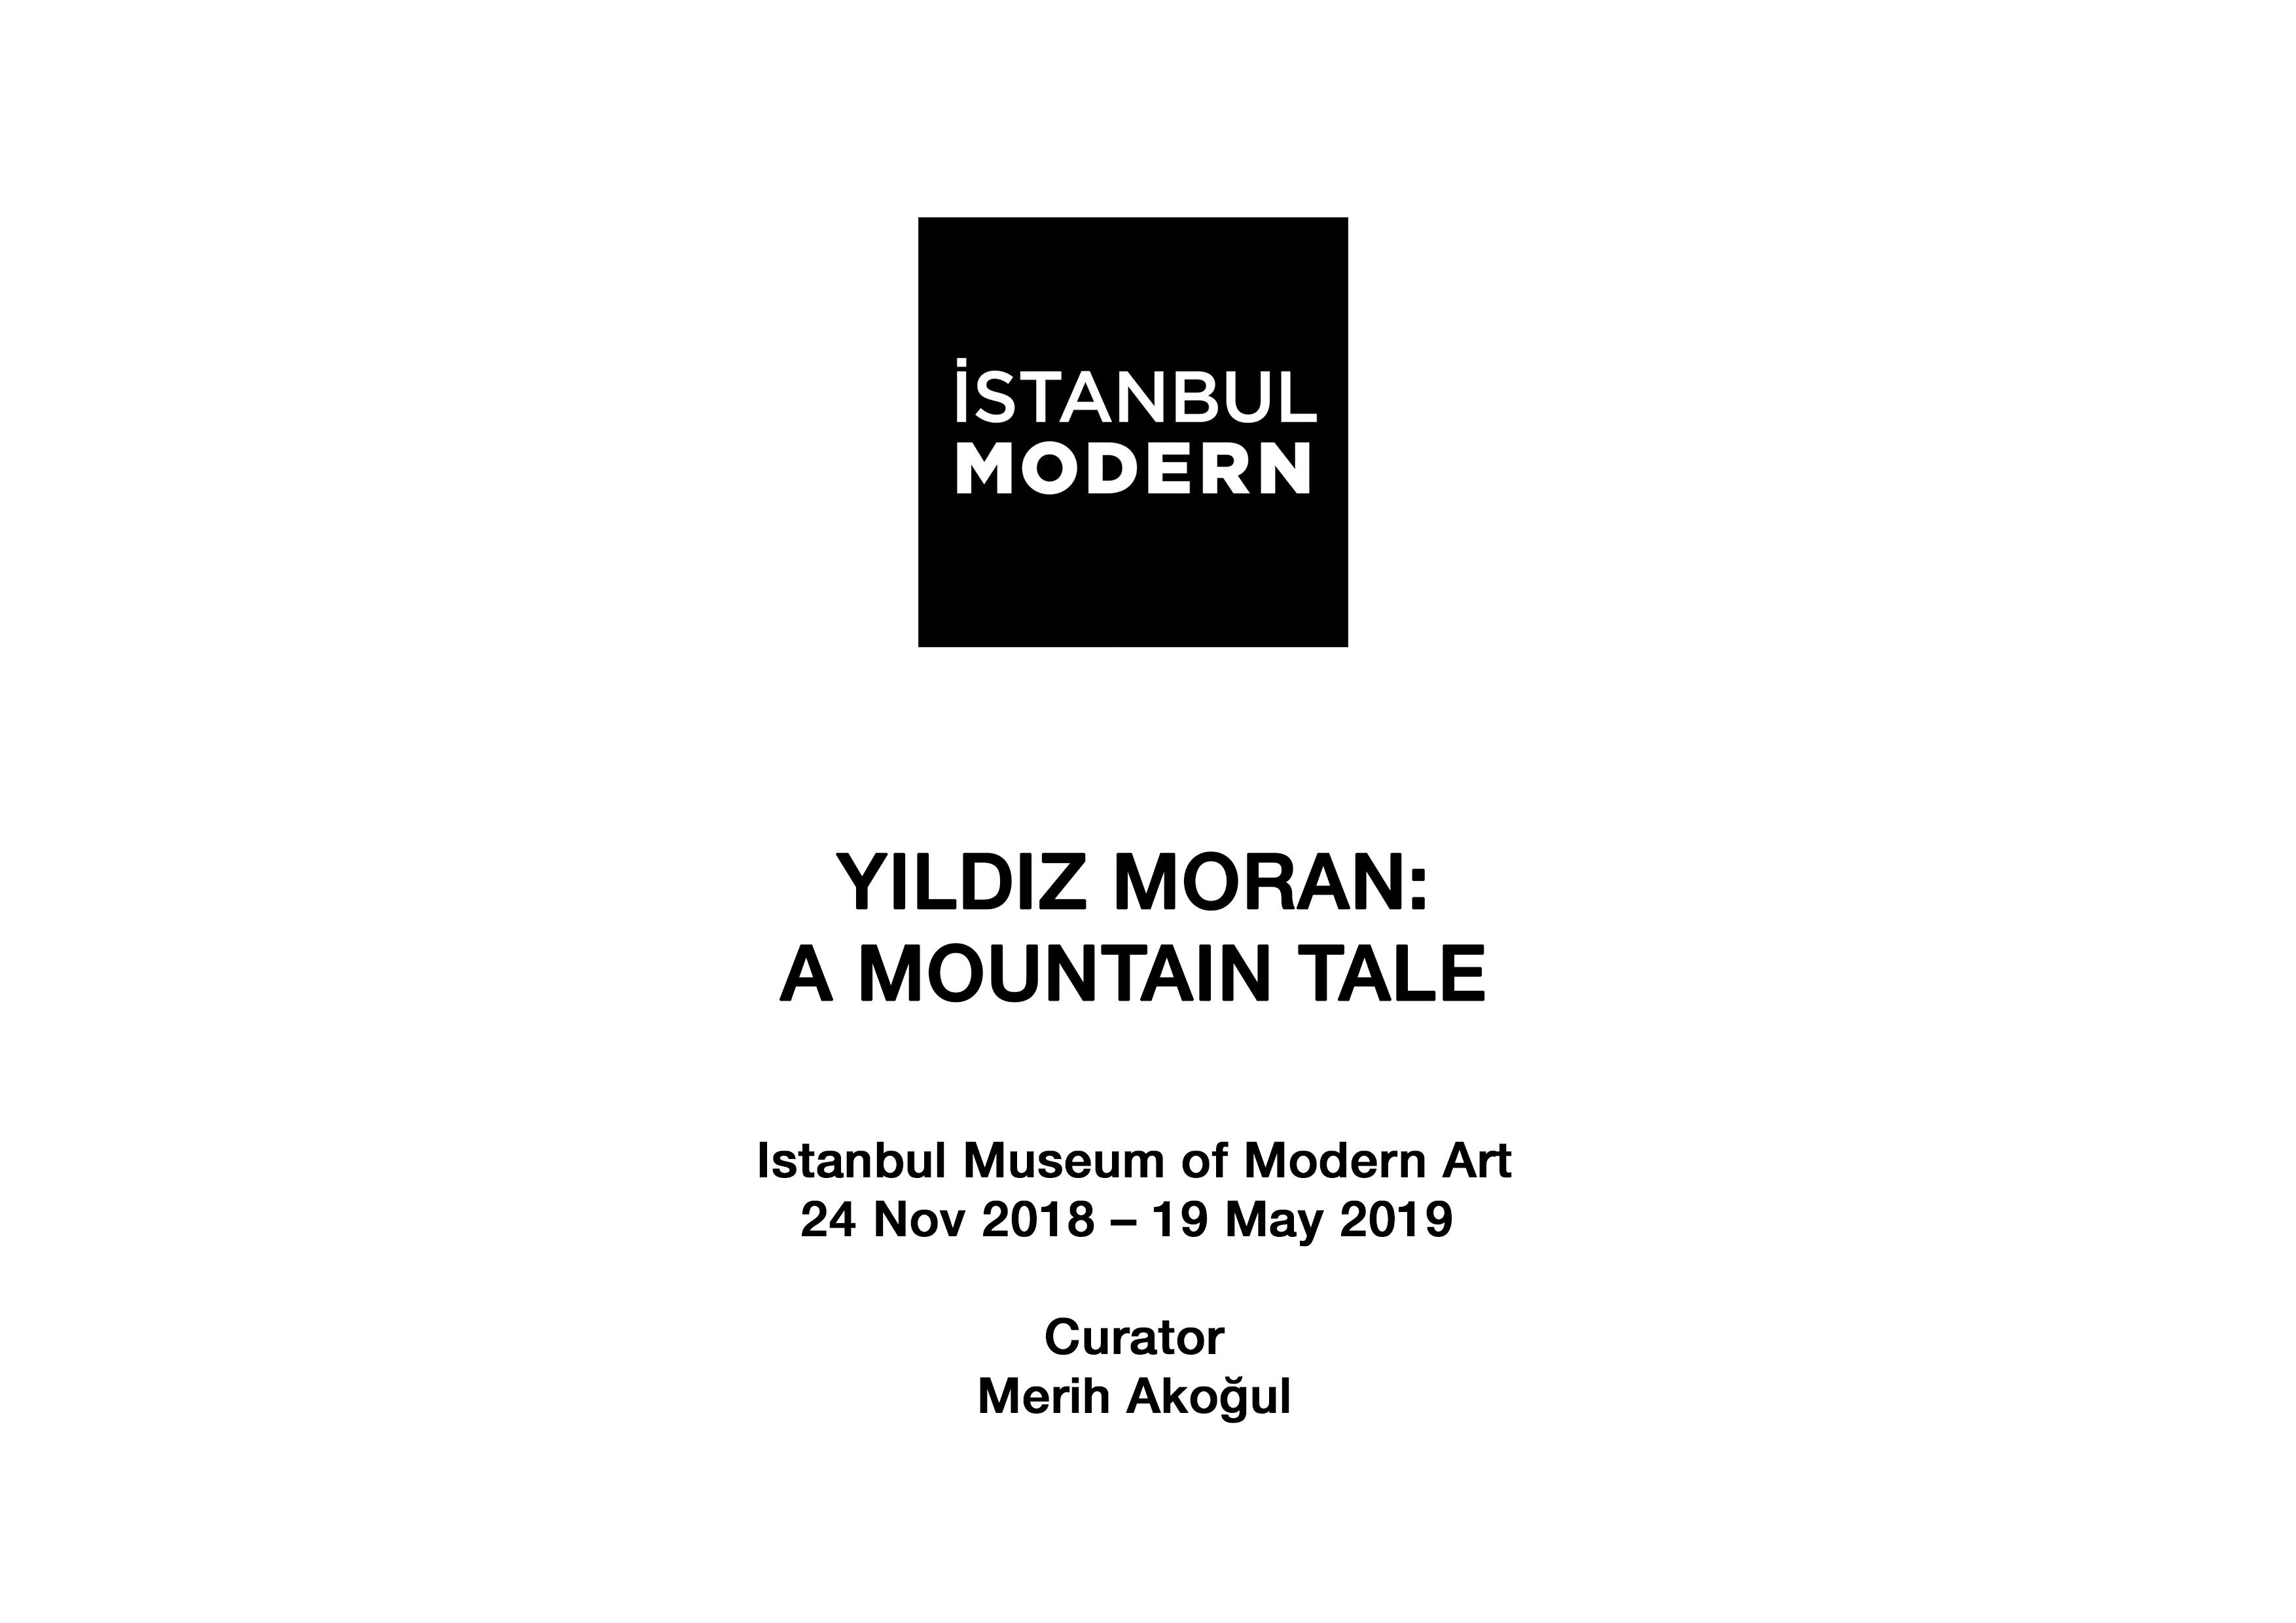 YILDIZ MORAN: A MOUNTAIN TALE